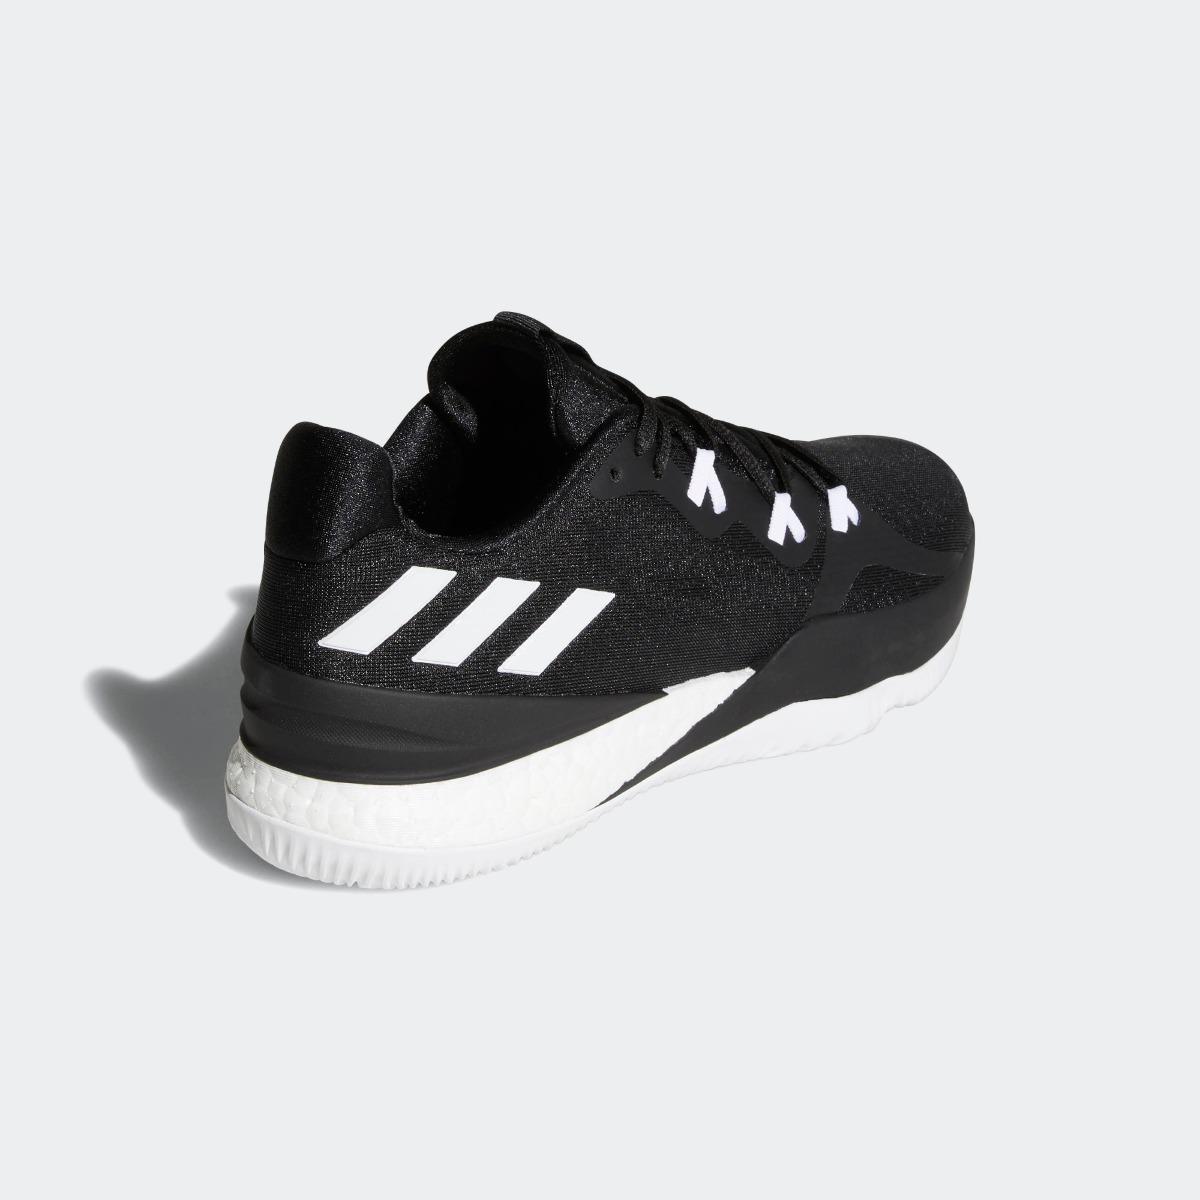 Adidas buty Crazy Light Boost 2018 BB7157 42 23